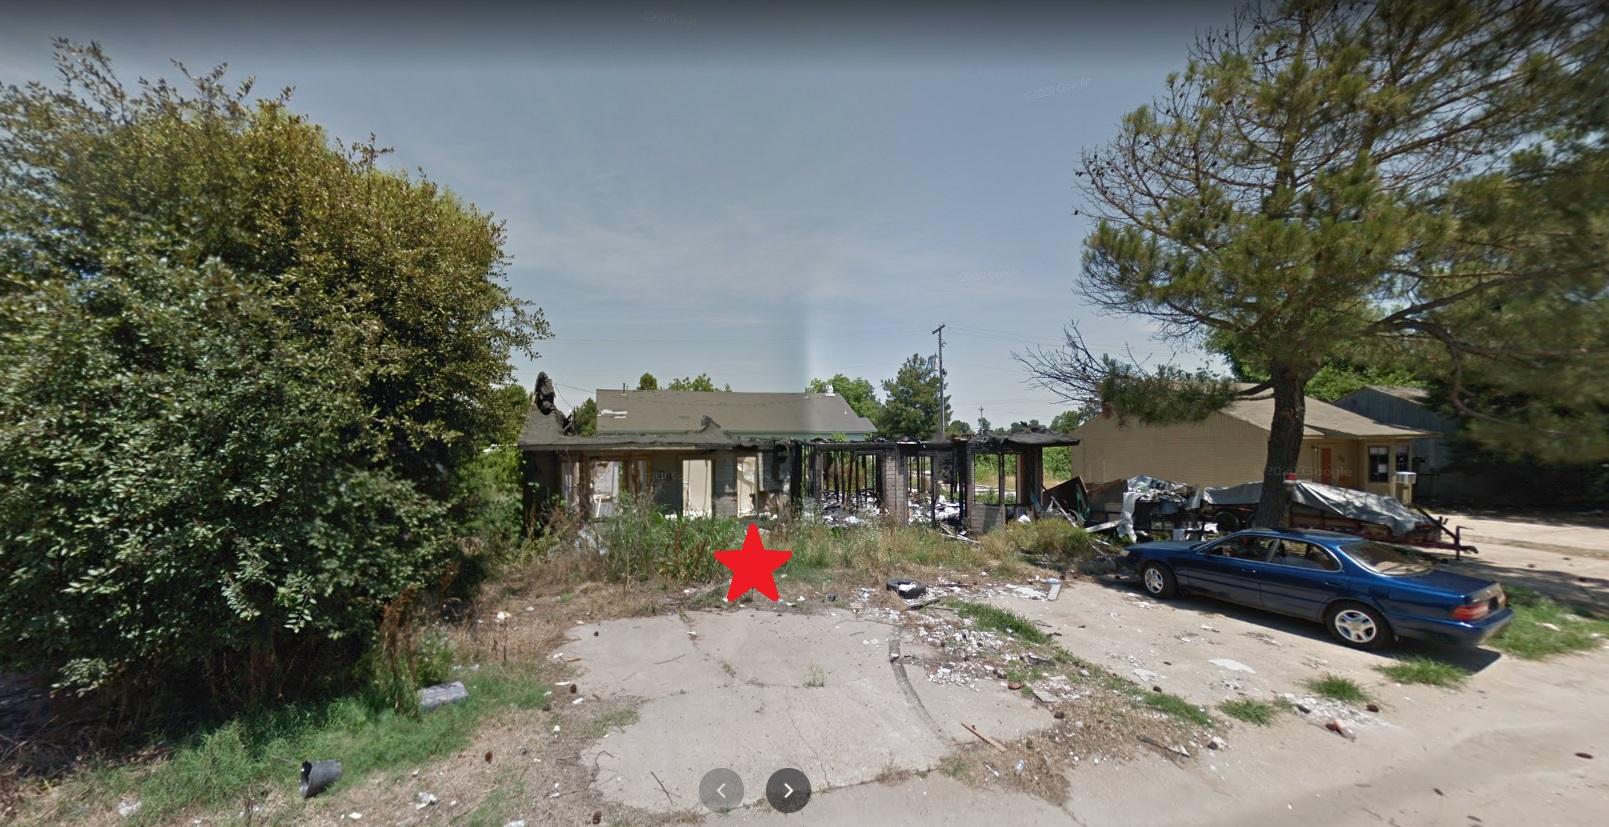 38 N Bristol Rd, Marion, AR 72364